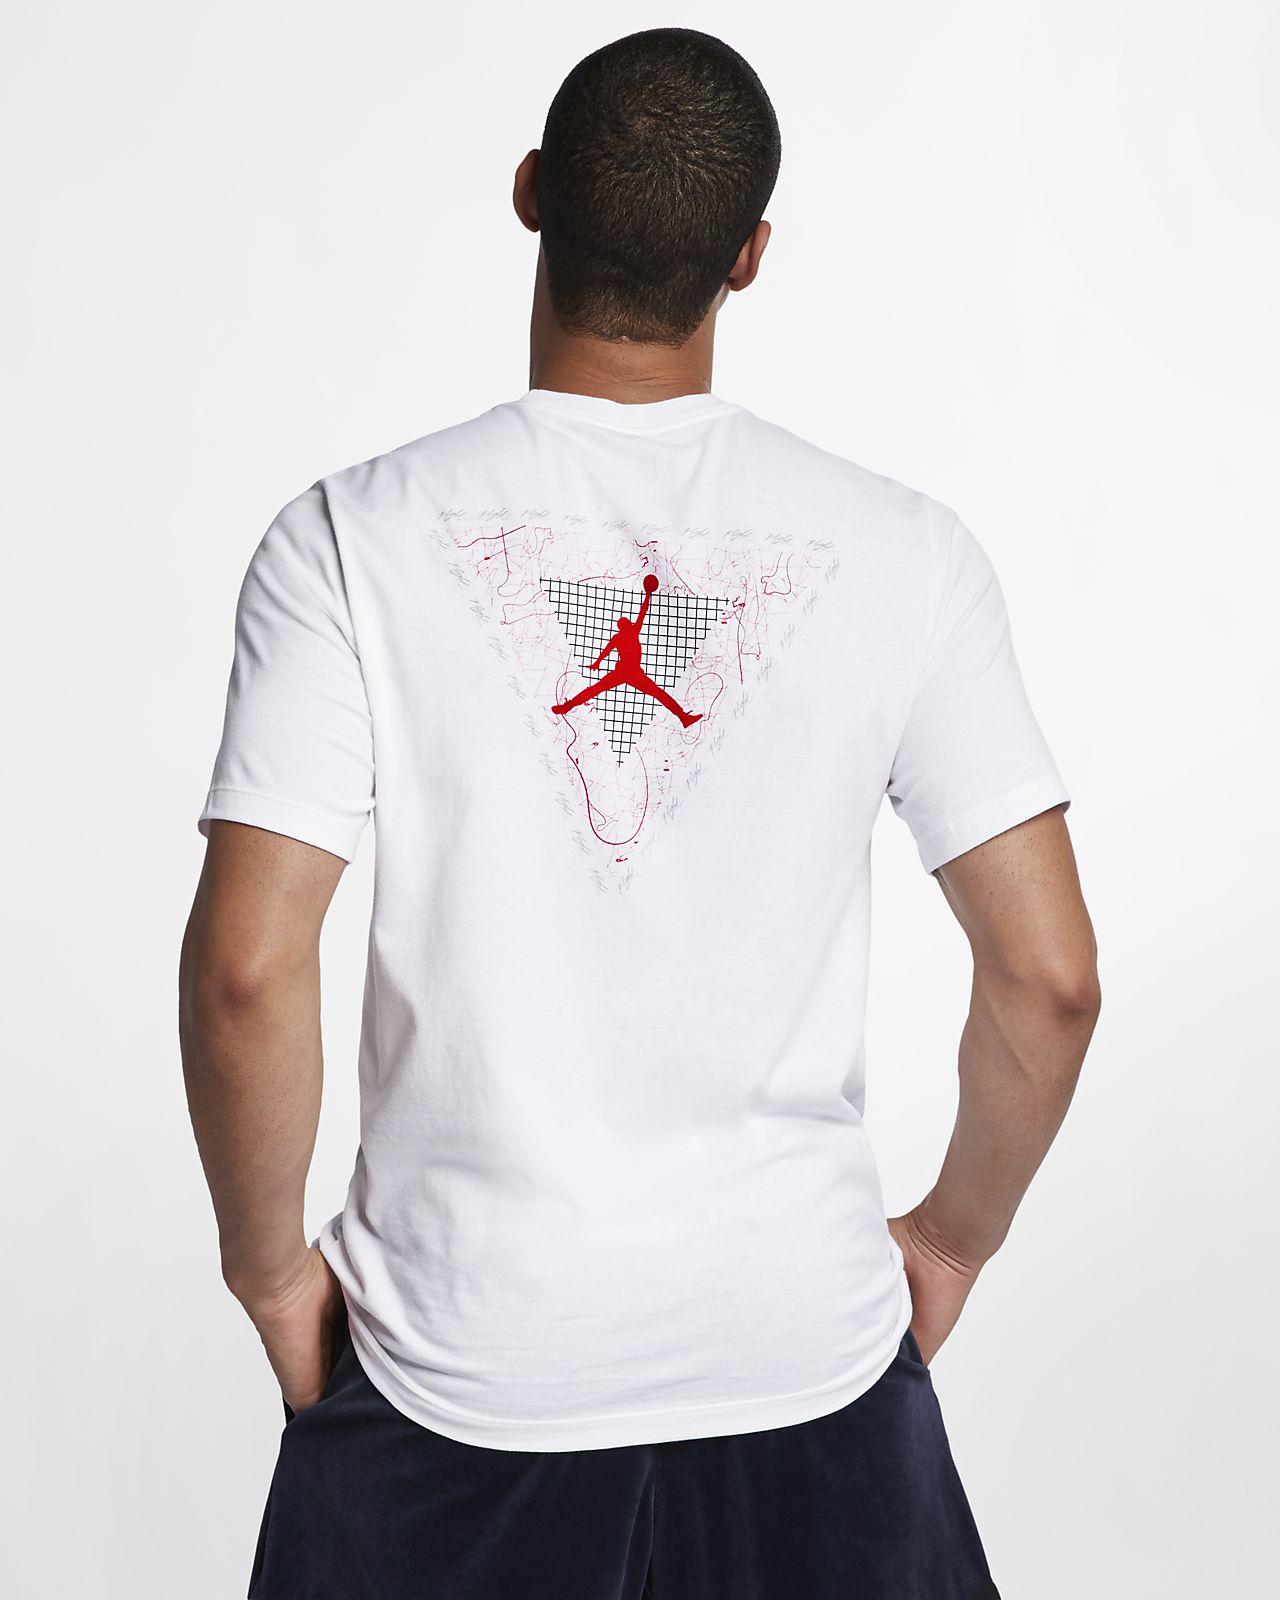 0b81525619fc Jordan Legacy AJ4 Men s T-Shirt. Nike.com ID